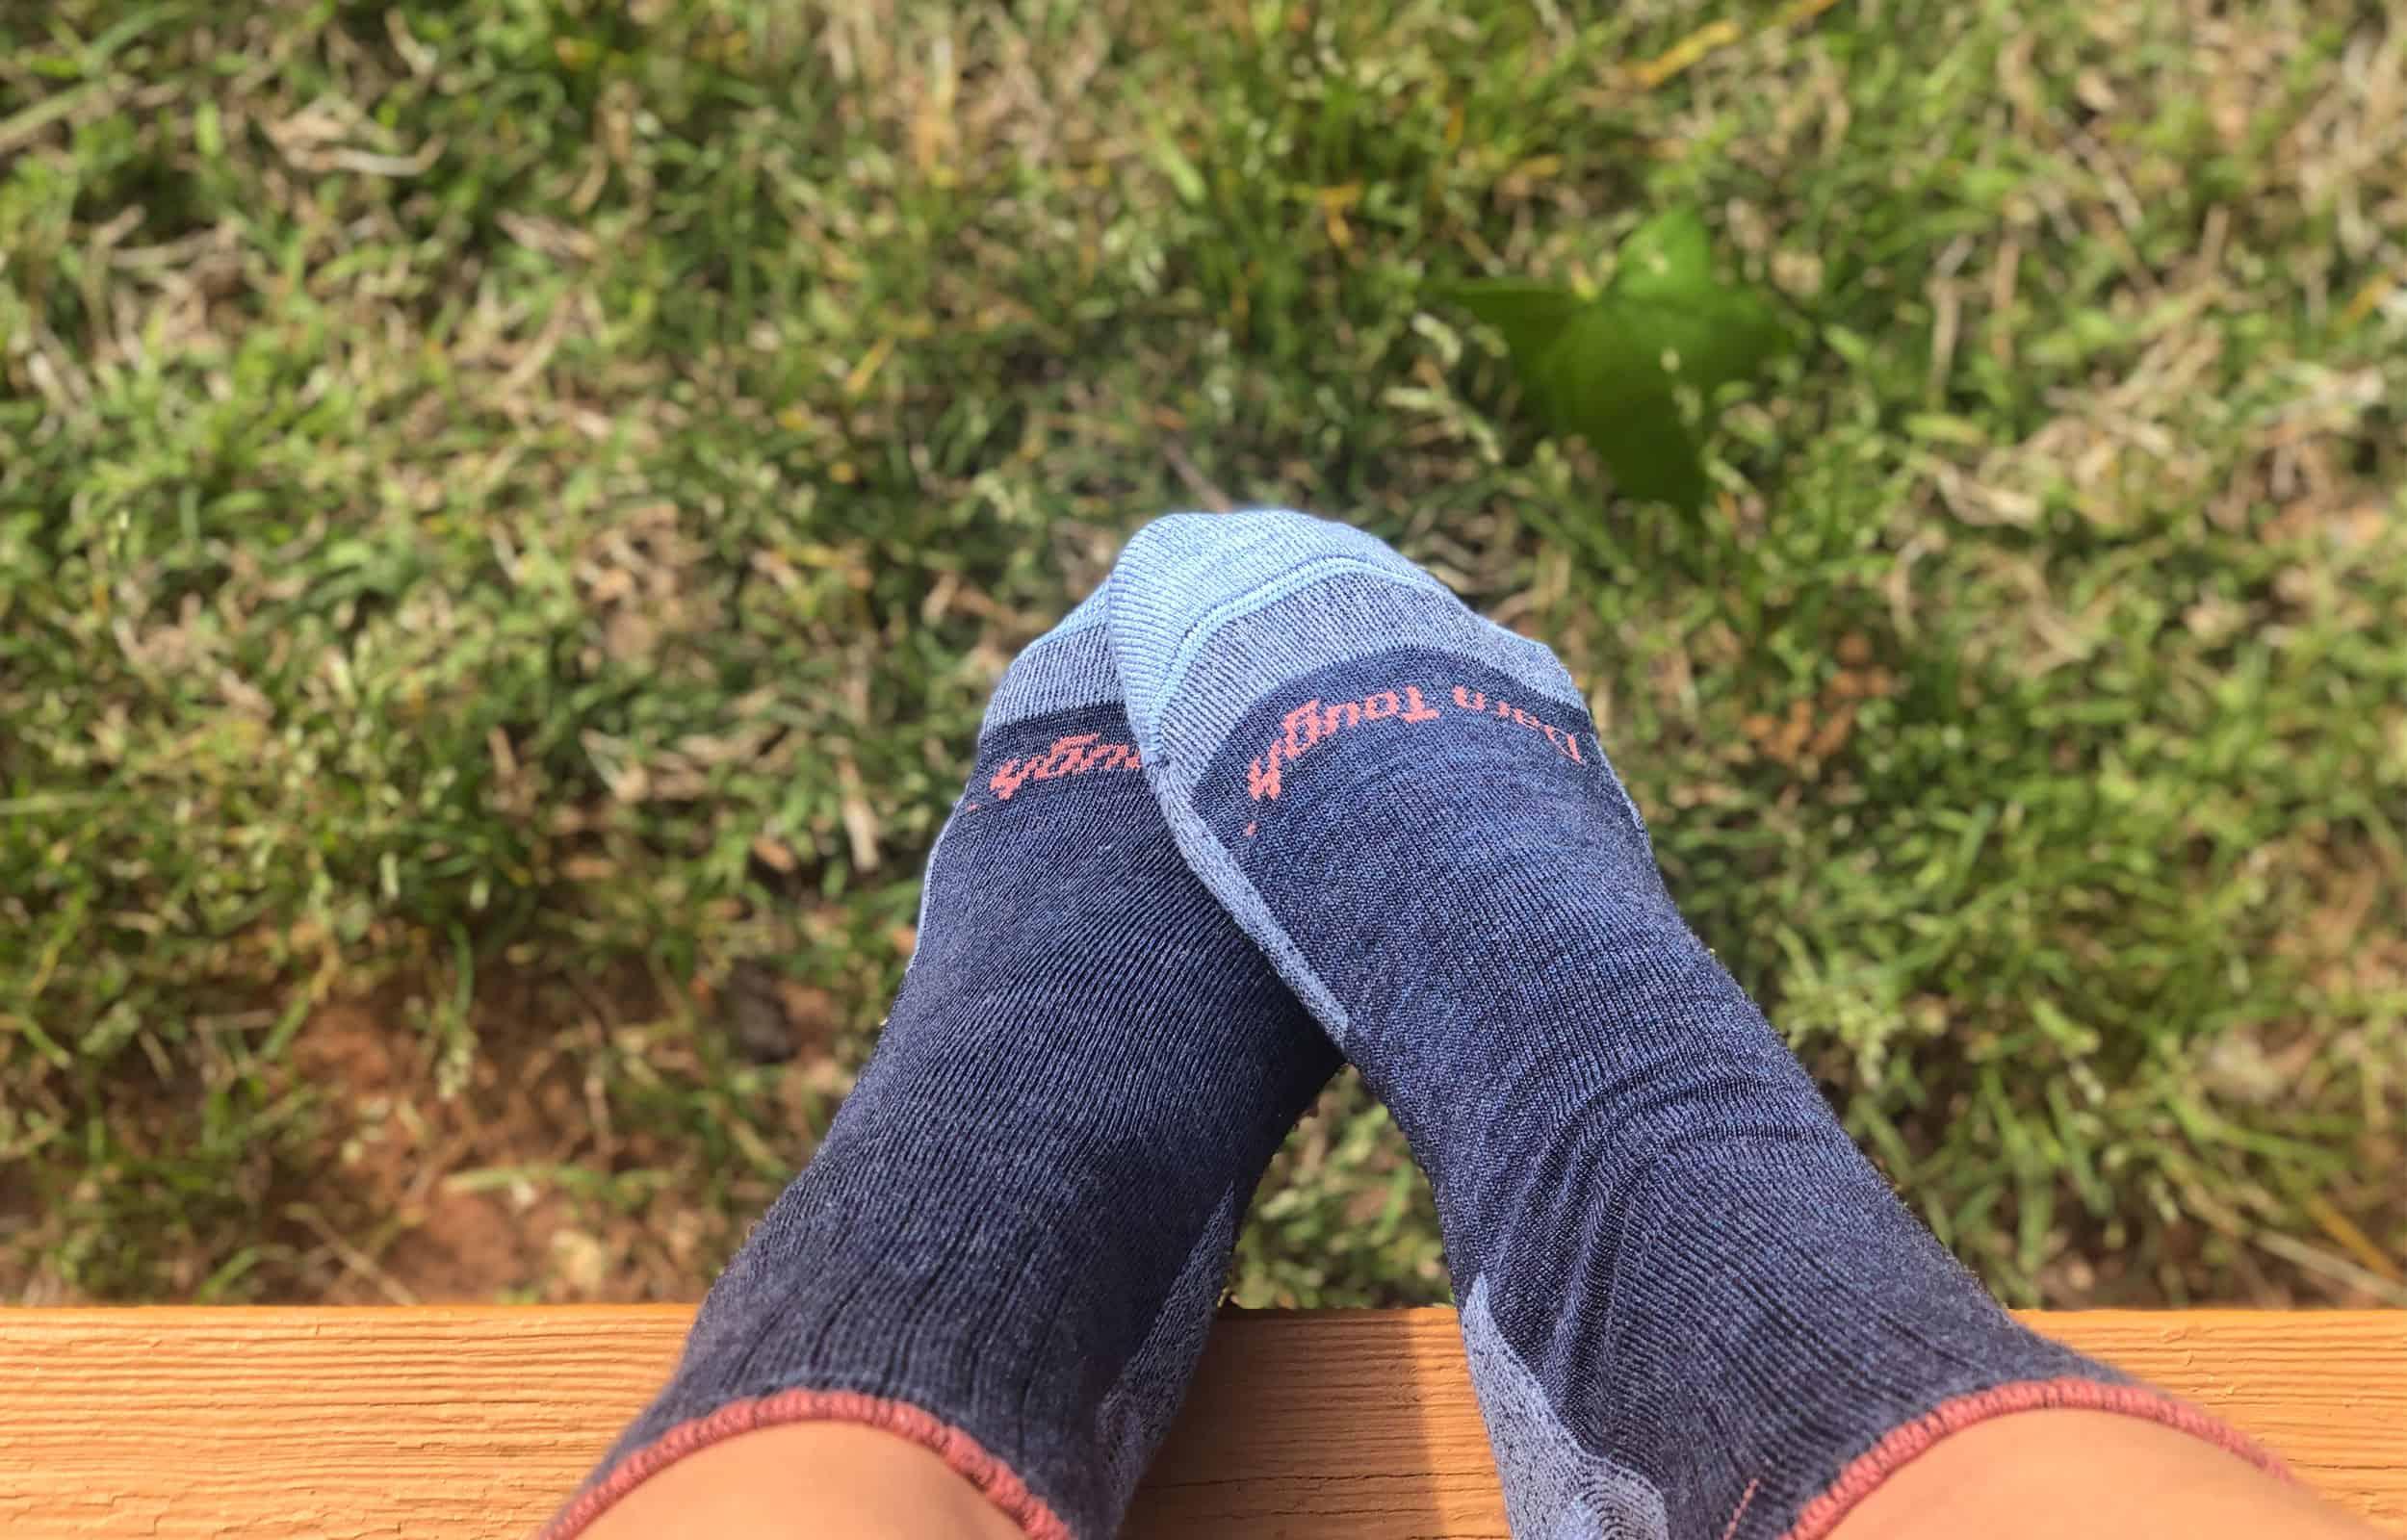 close up view of darn tough blue socks